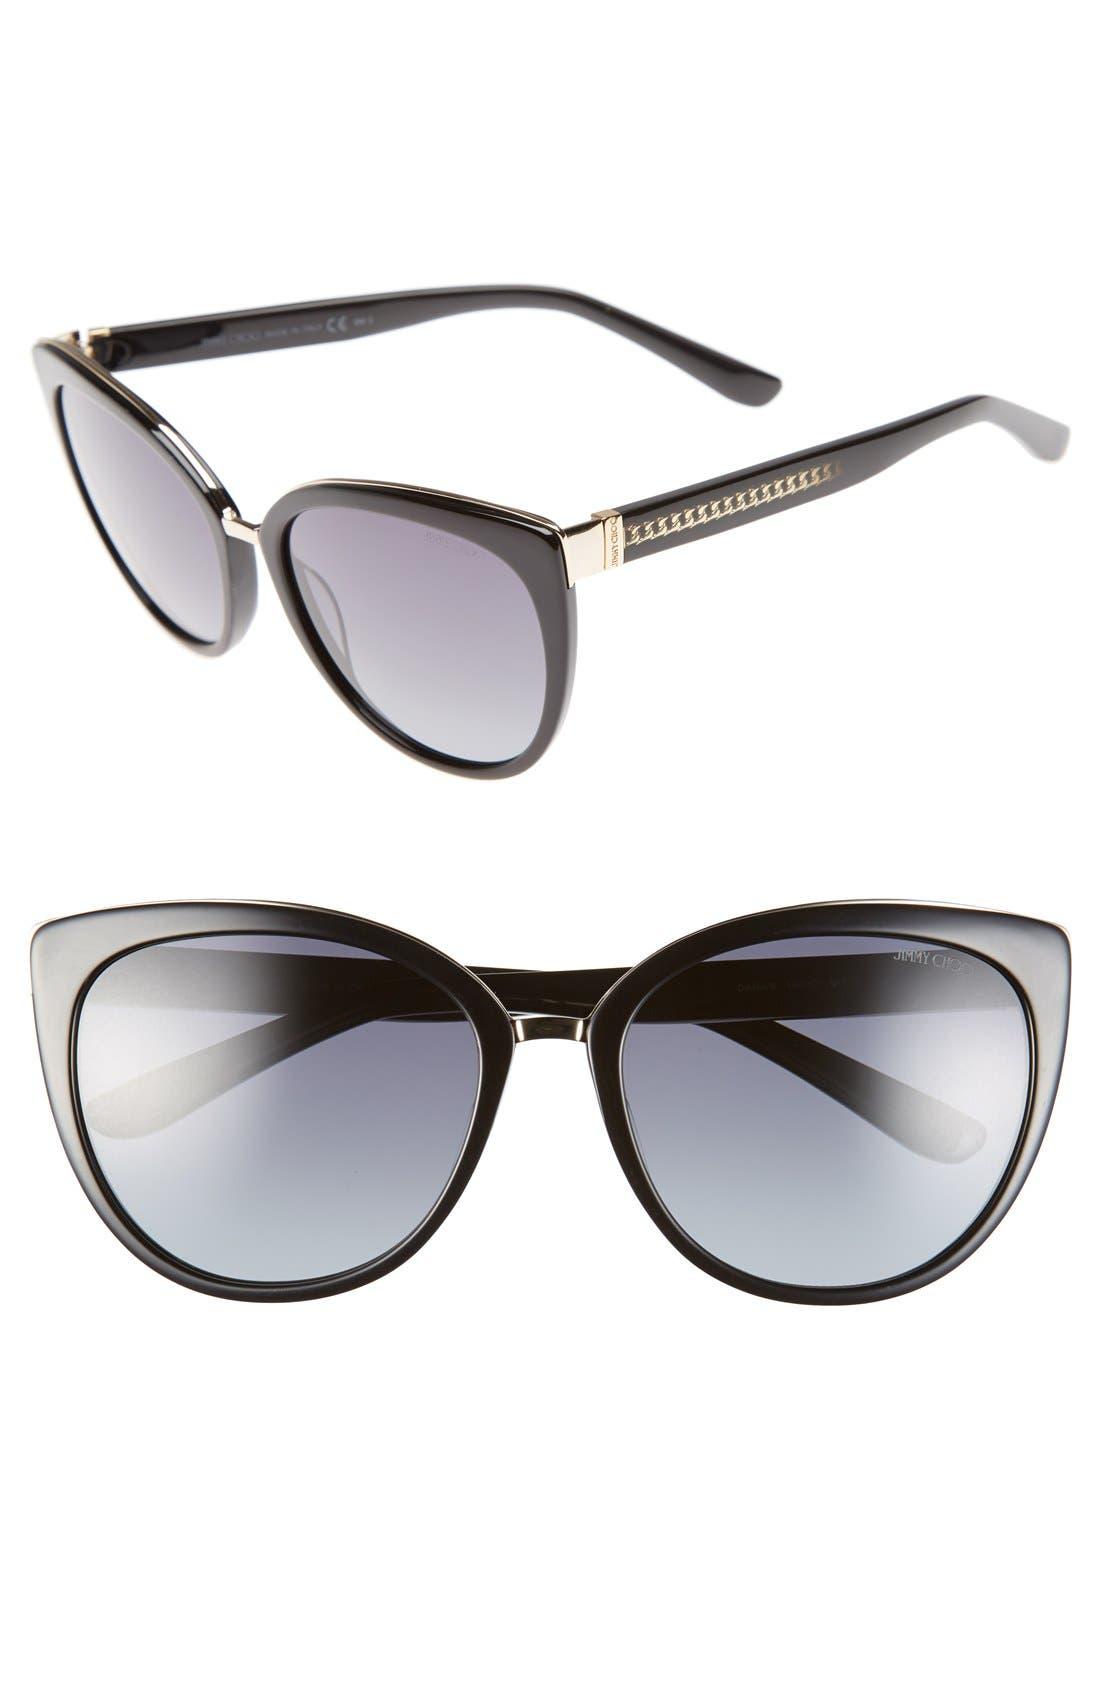 Jimmy Choo 'Danas' 56mm Cat Eye Sunglasses